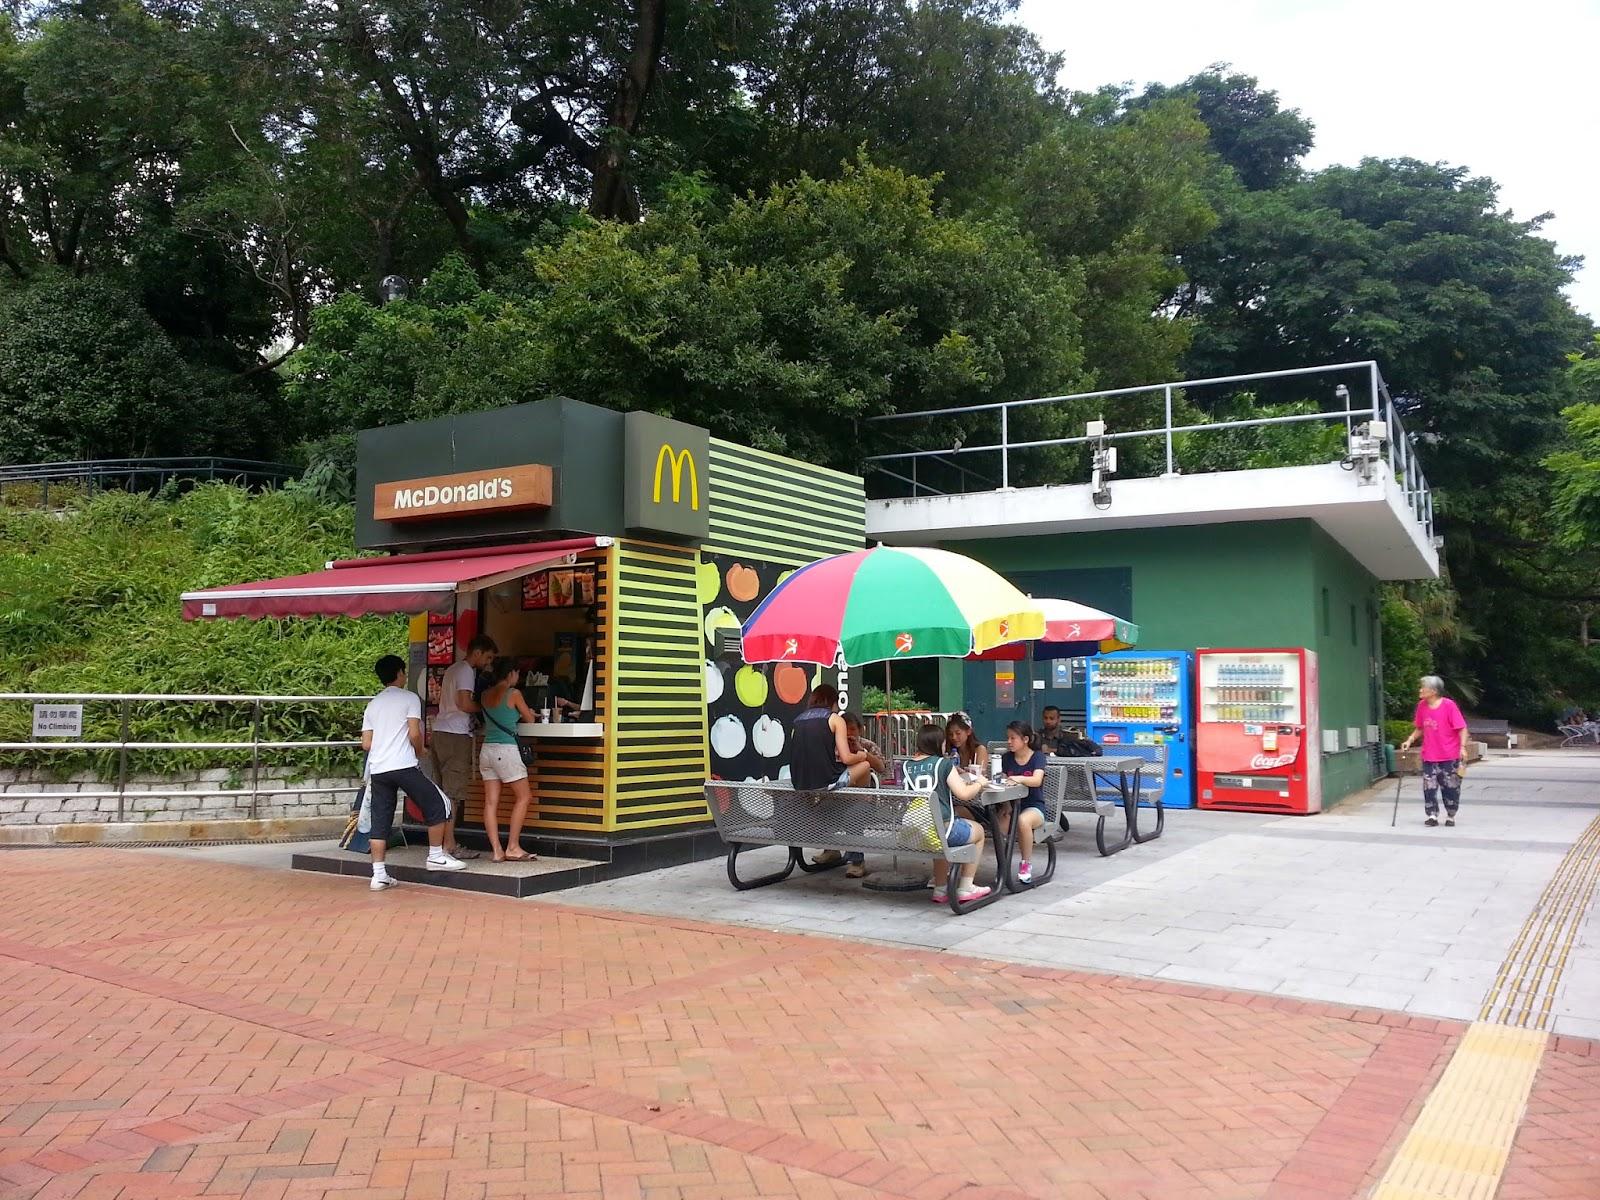 SPD4459 東張西望反轉油尖旺 Yau Tsim Mong x PDF: SPD4459-[尖沙咀景點] 第二站 - 九龍公園 Kowloon Park